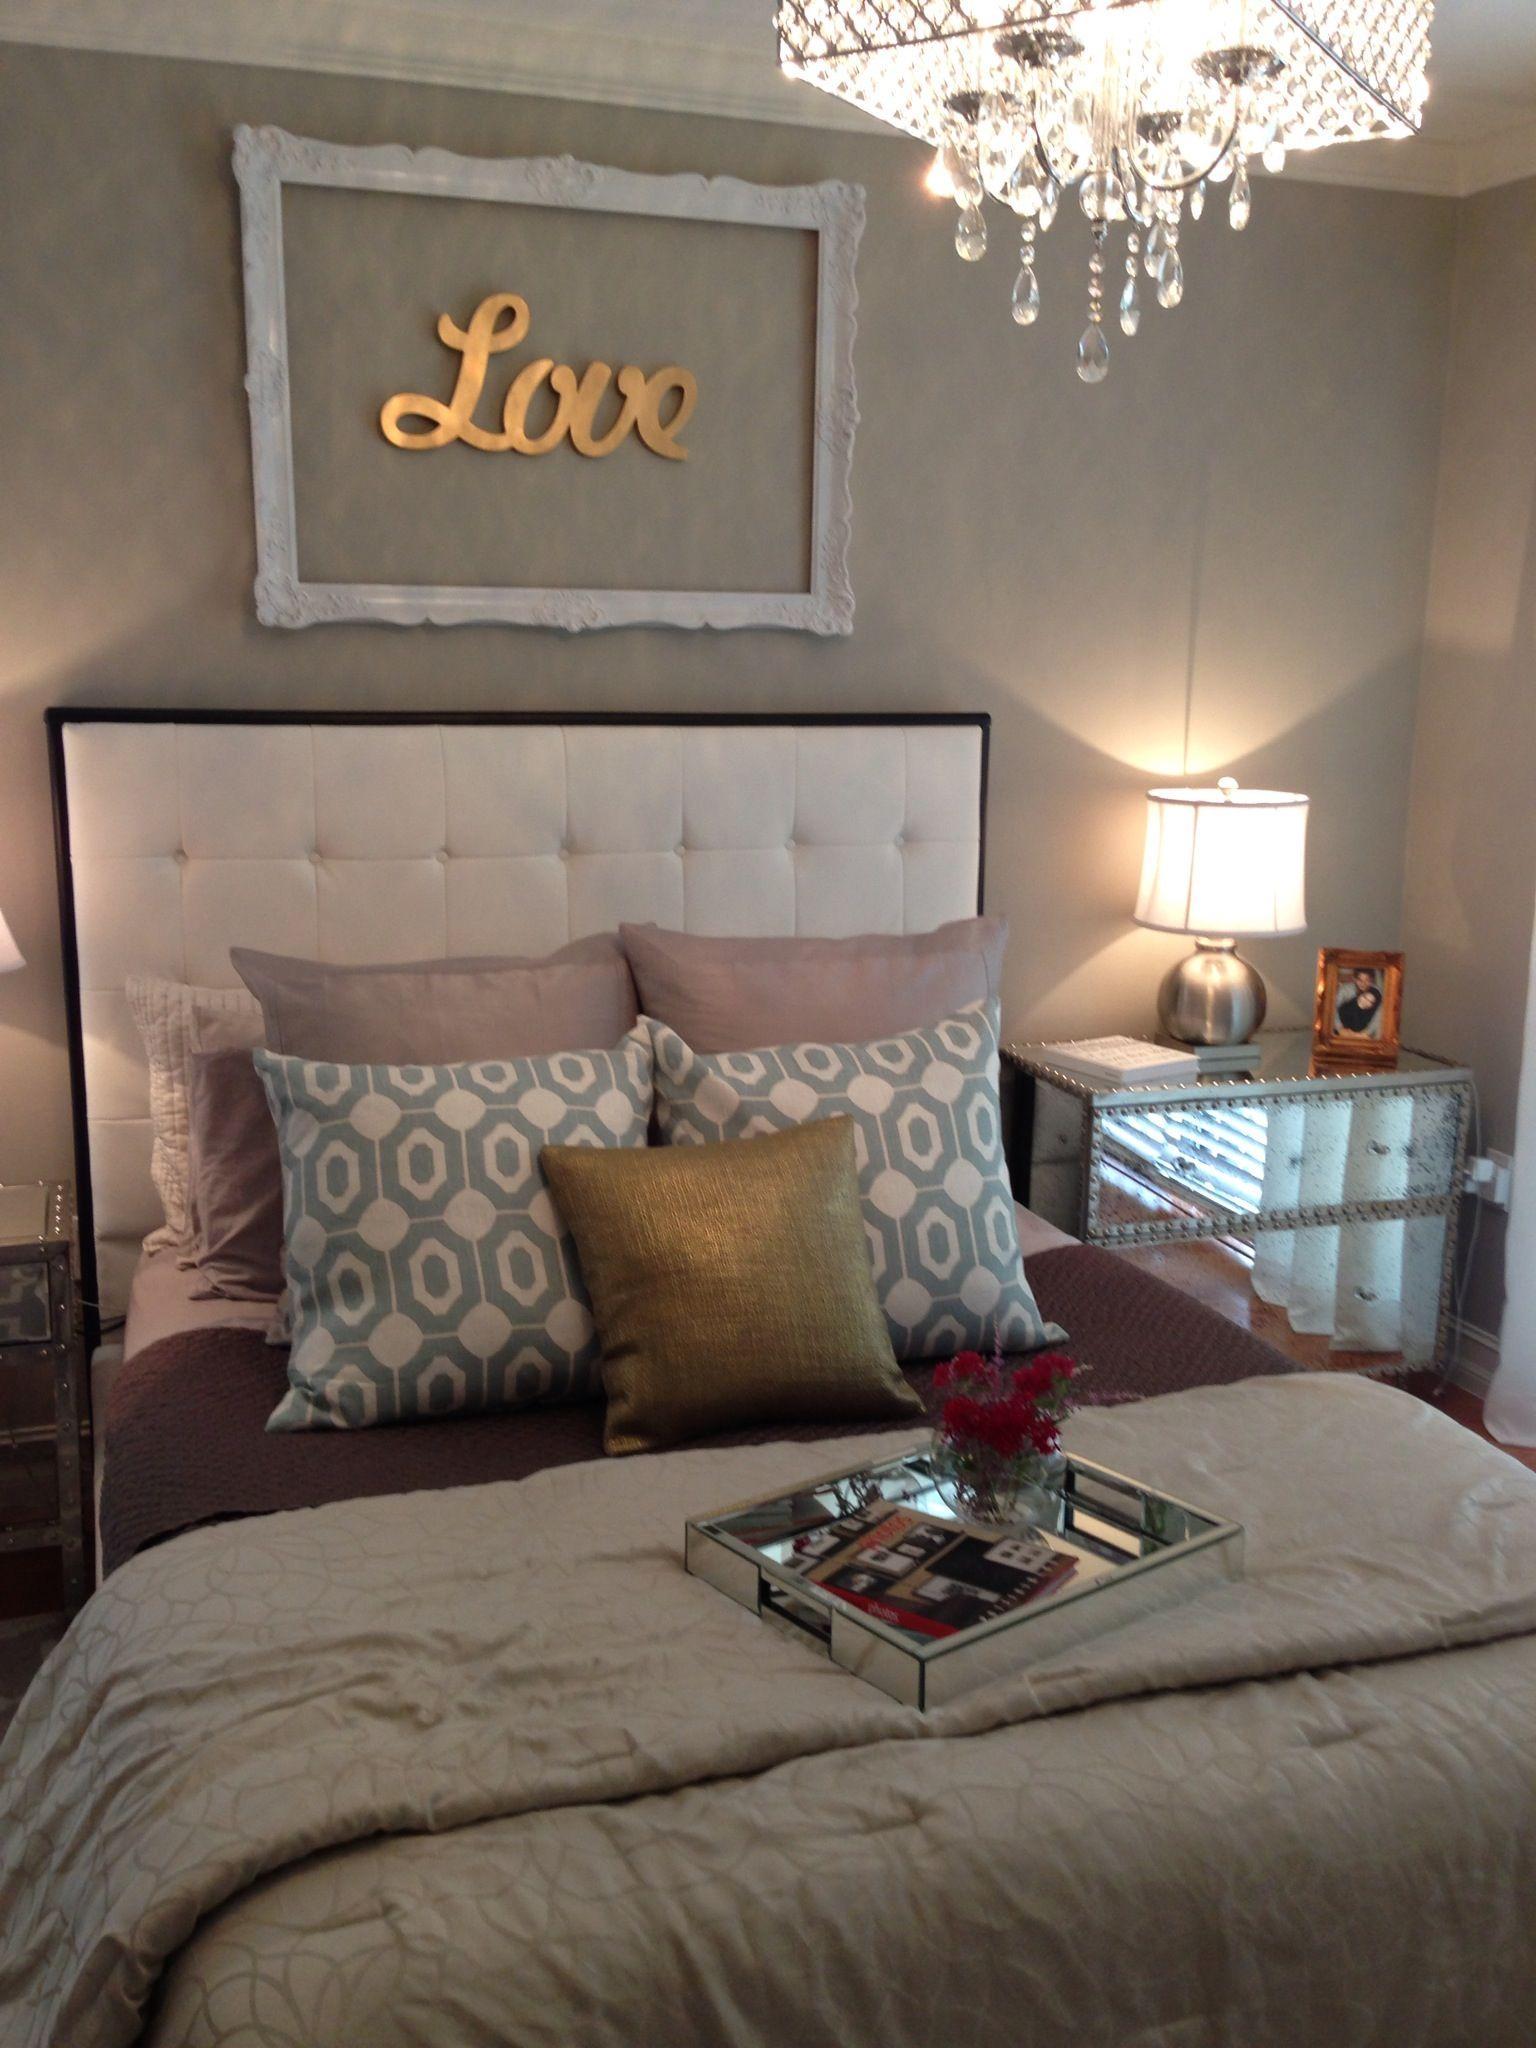 Themotivatedtype On Etsy Bedrooms Bedroom Decor